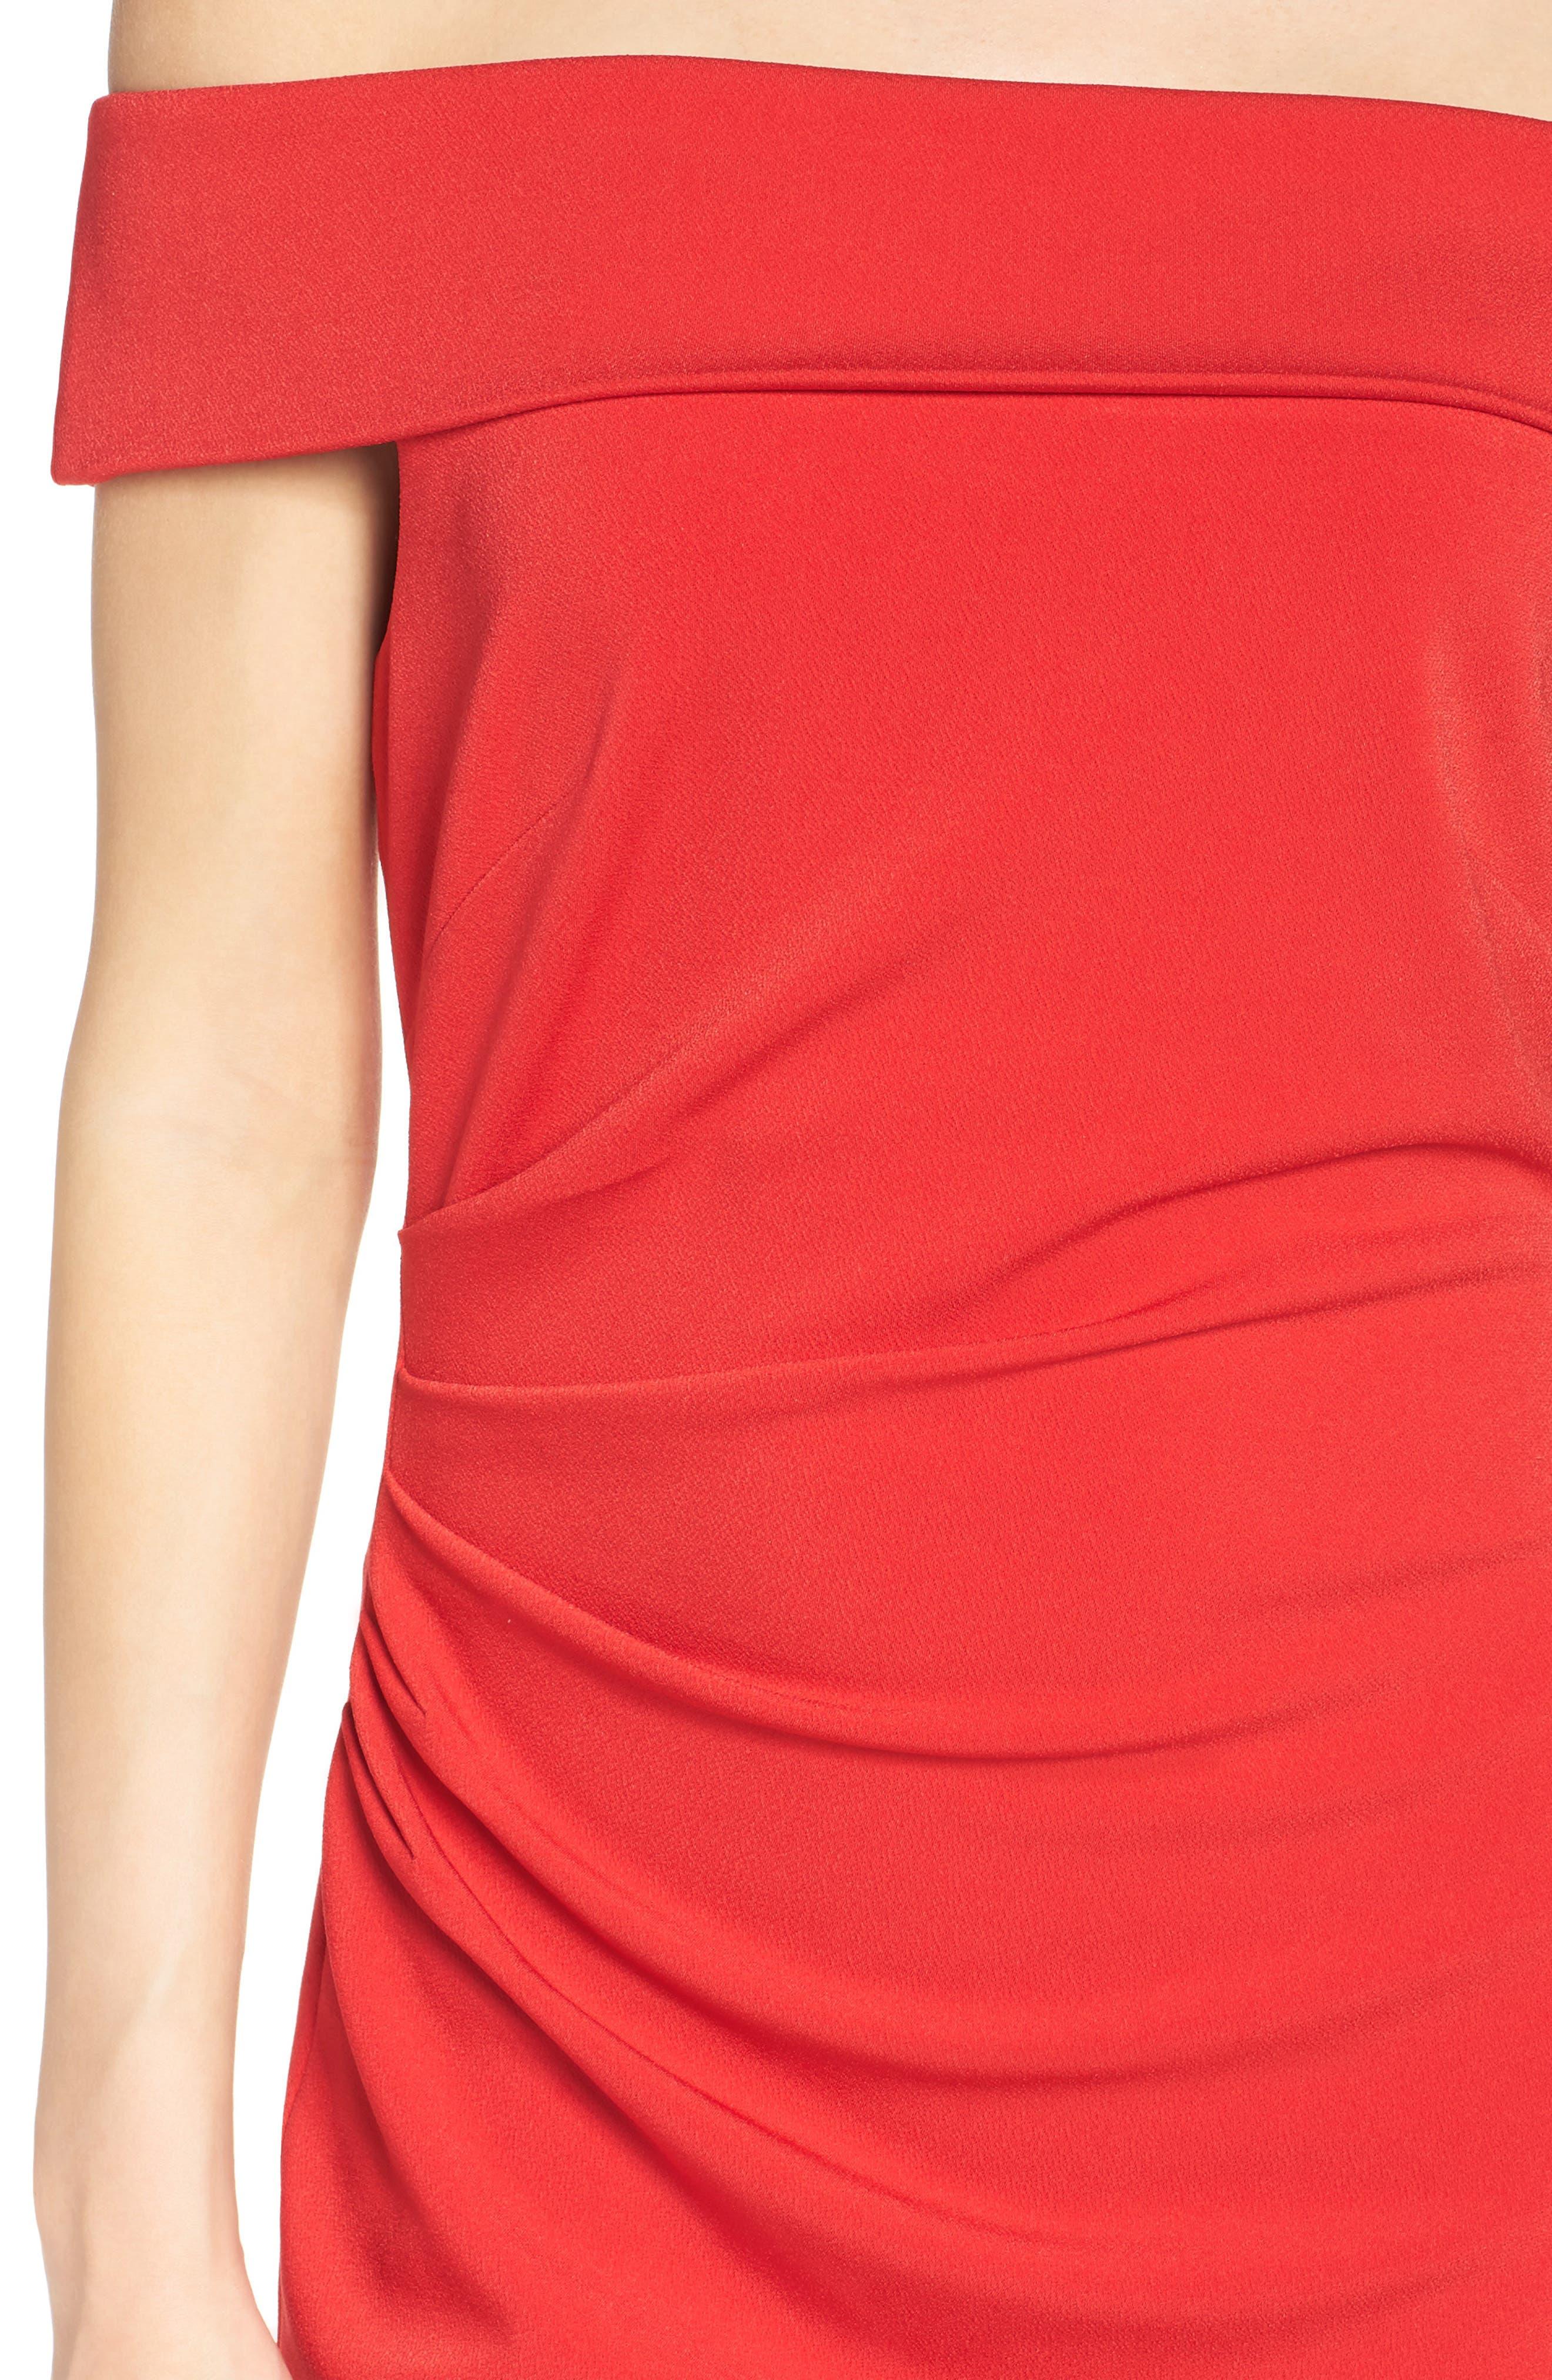 Off the Shoulder Crepe Sheath Dress,                             Alternate thumbnail 5, color,                             Red